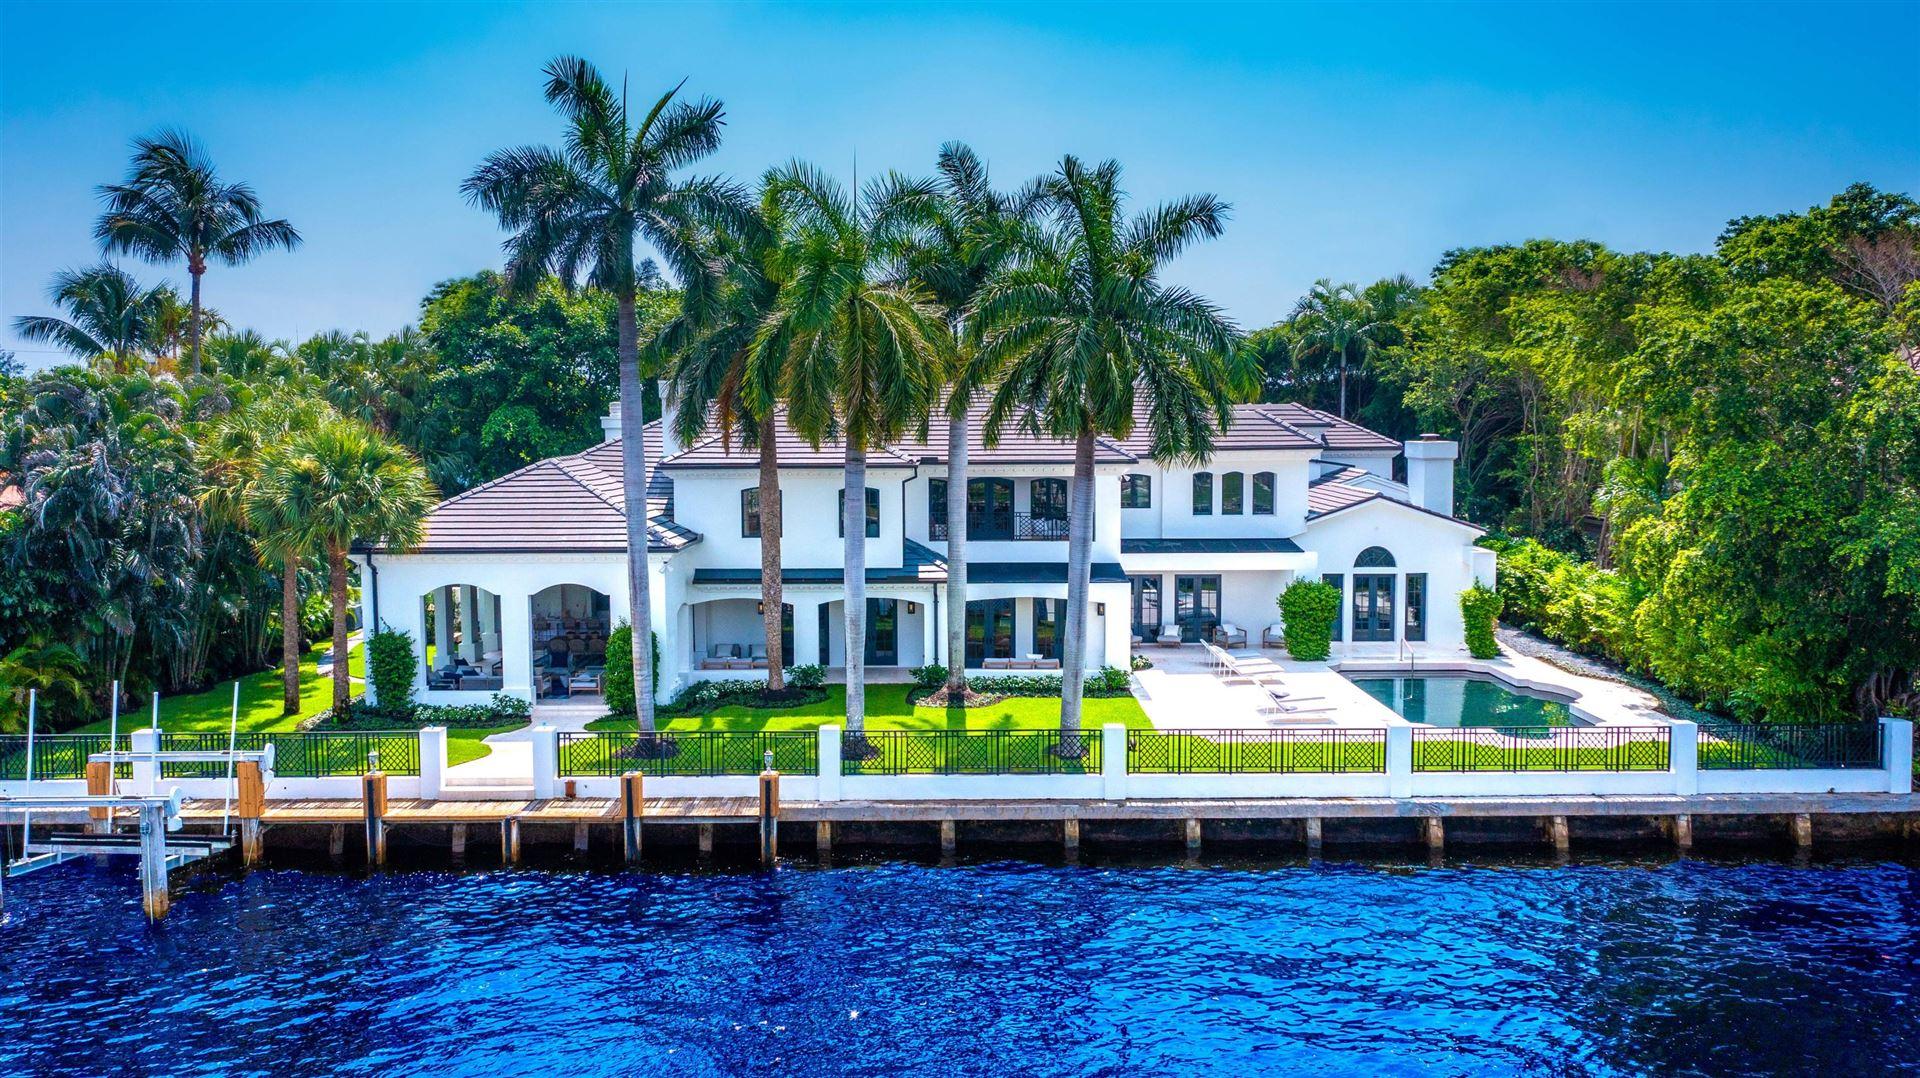 2401 Spanish River Road, Boca Raton, FL 33432 - #: RX-10630806